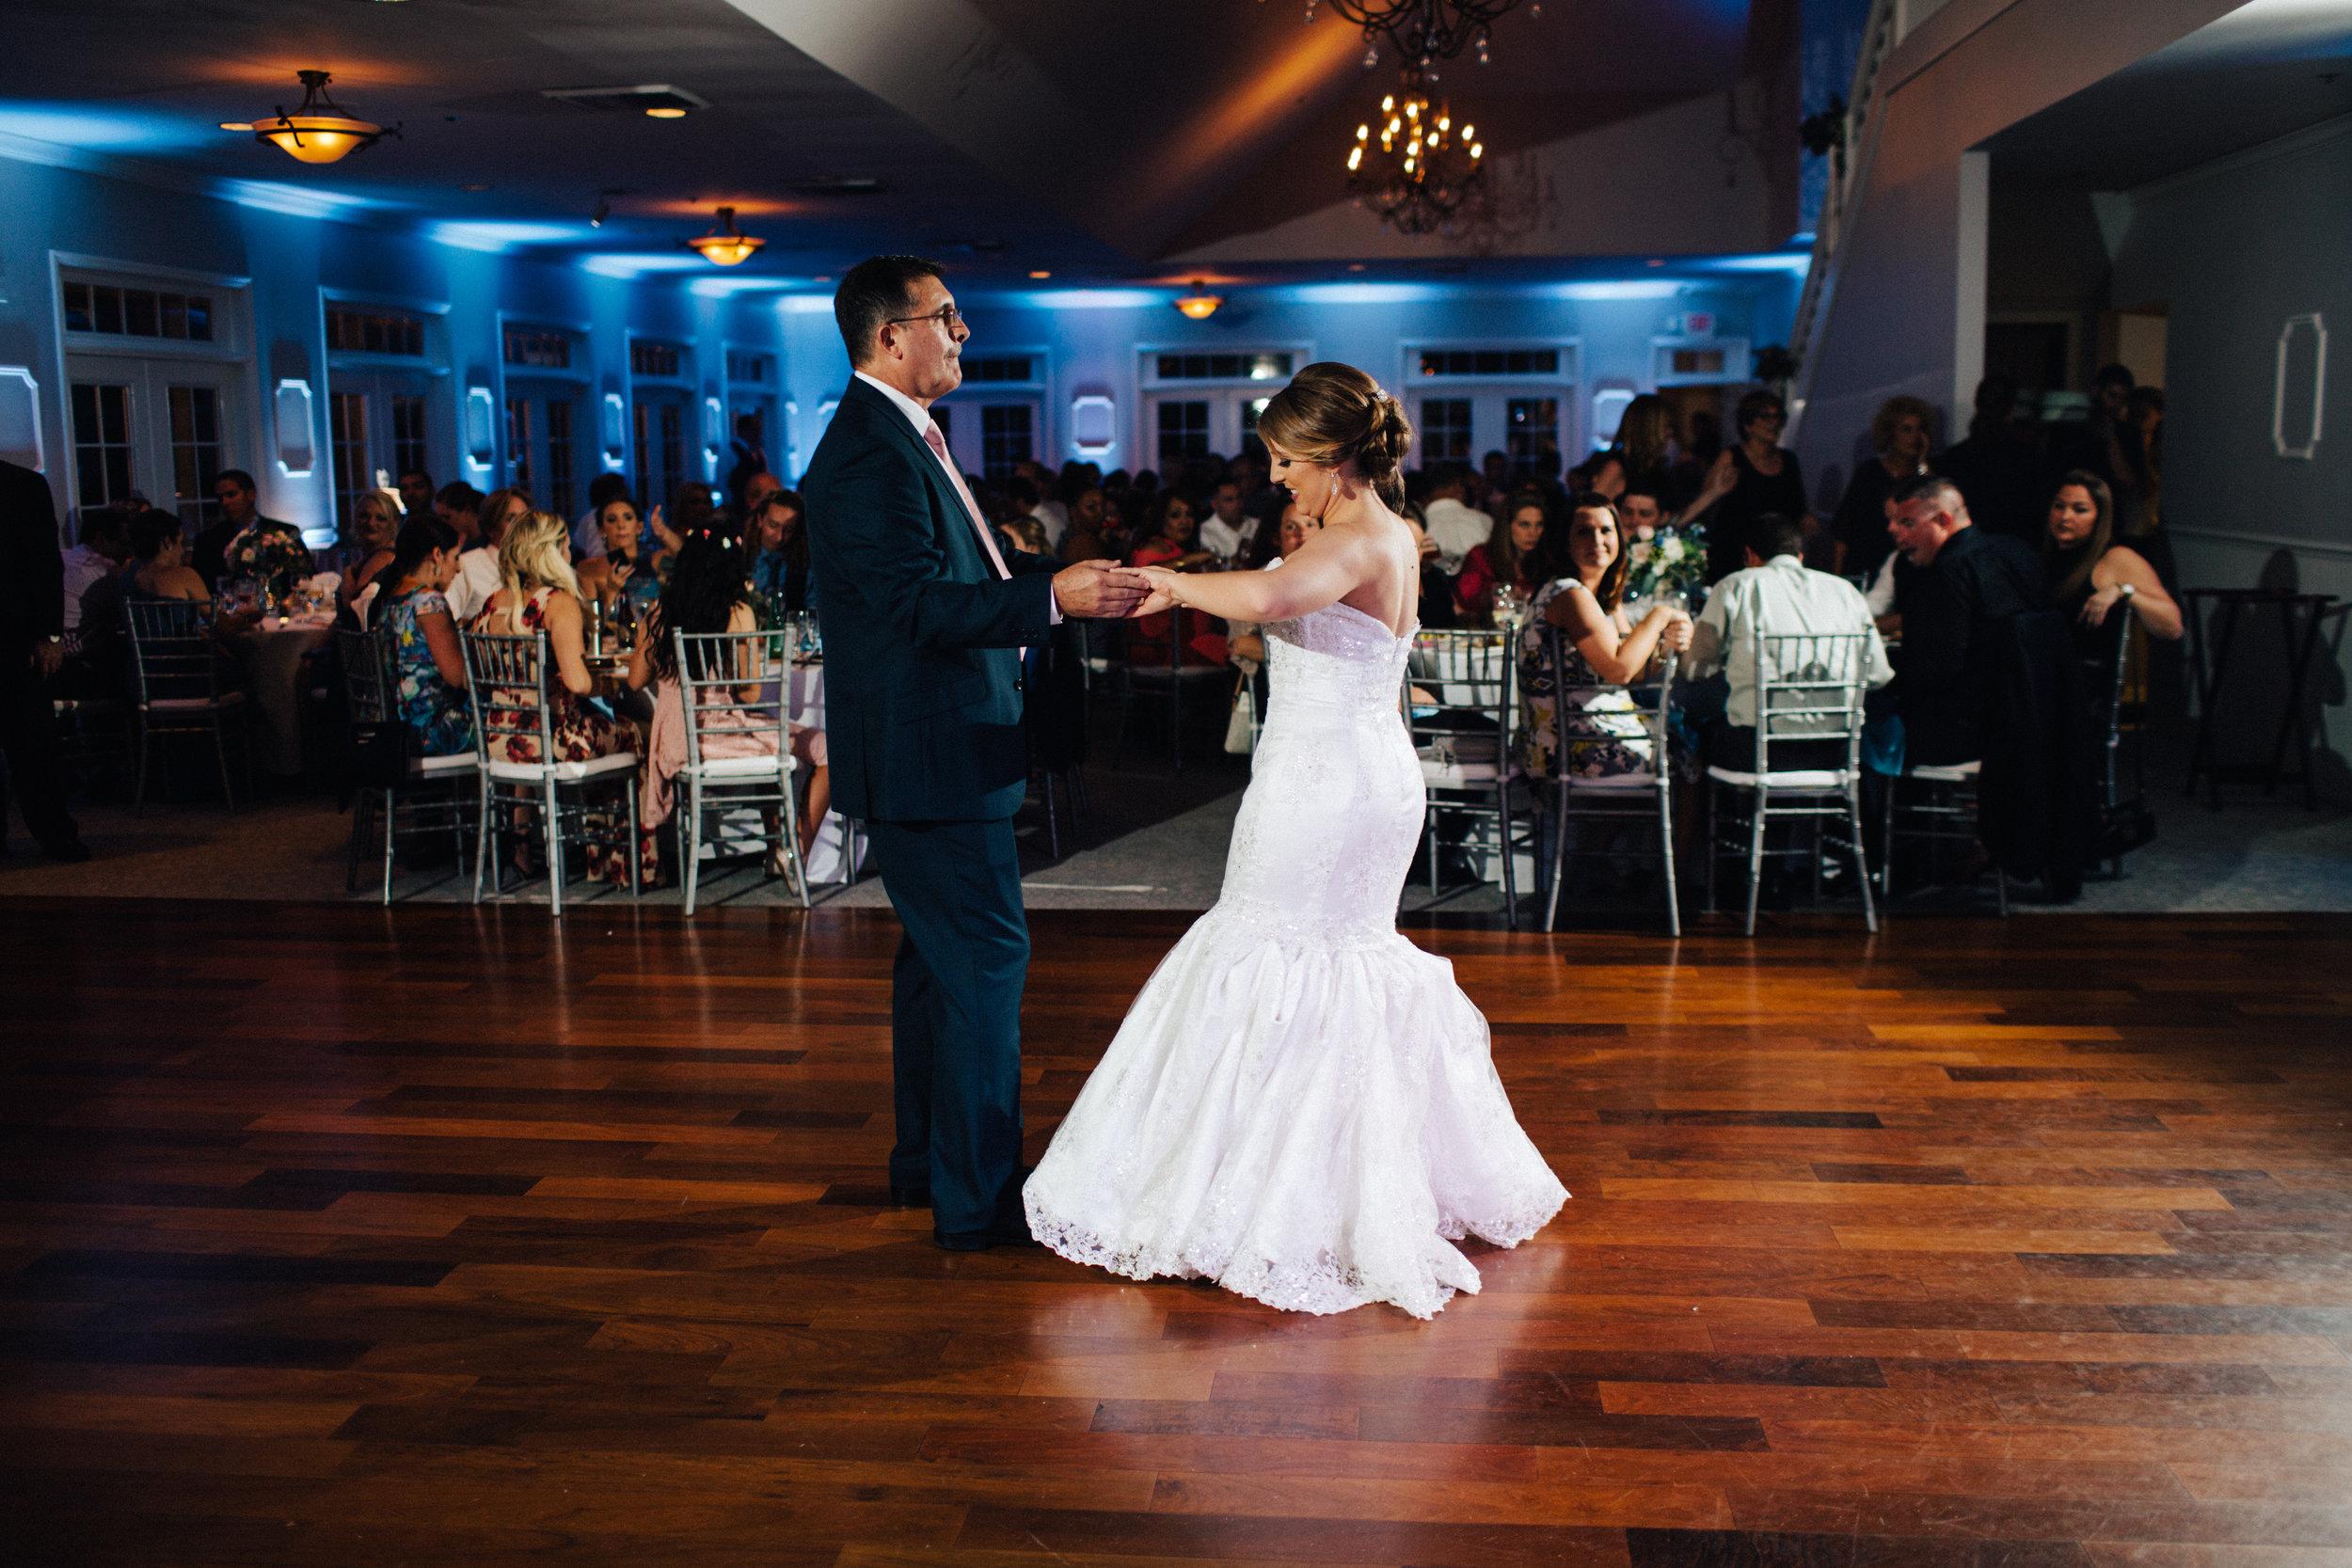 Tuskawilla Country Club Wedding Photographer-94.jpg